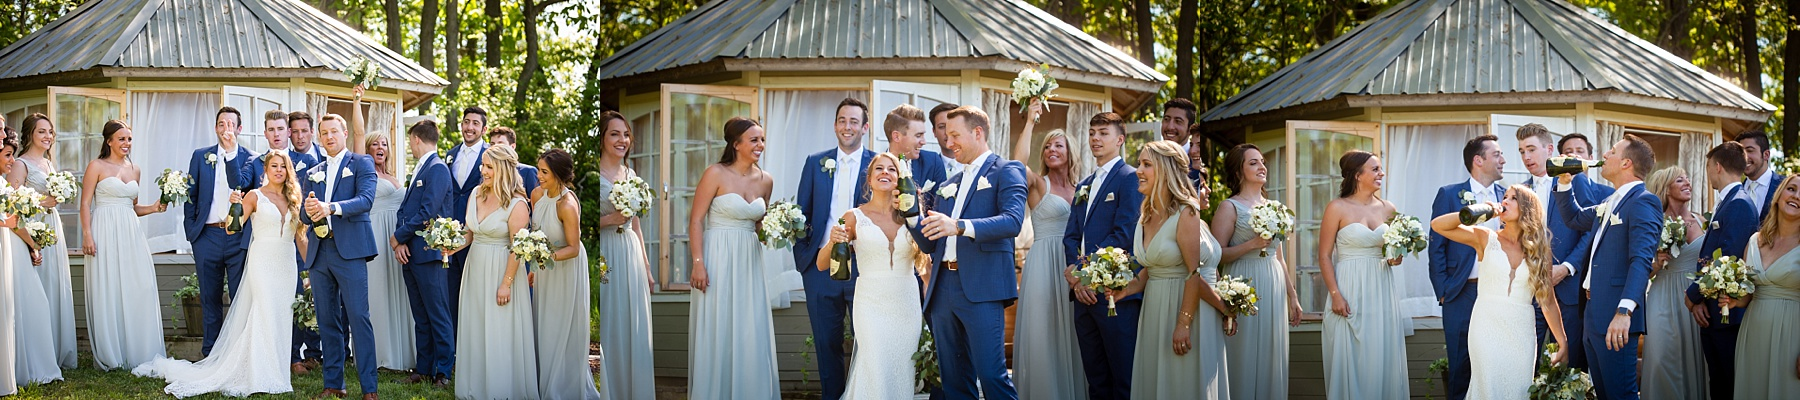 Brandon_Shafer_Photography_Kara_Doug_12_corners_Wedding_Benton_Harbor_0045.jpg